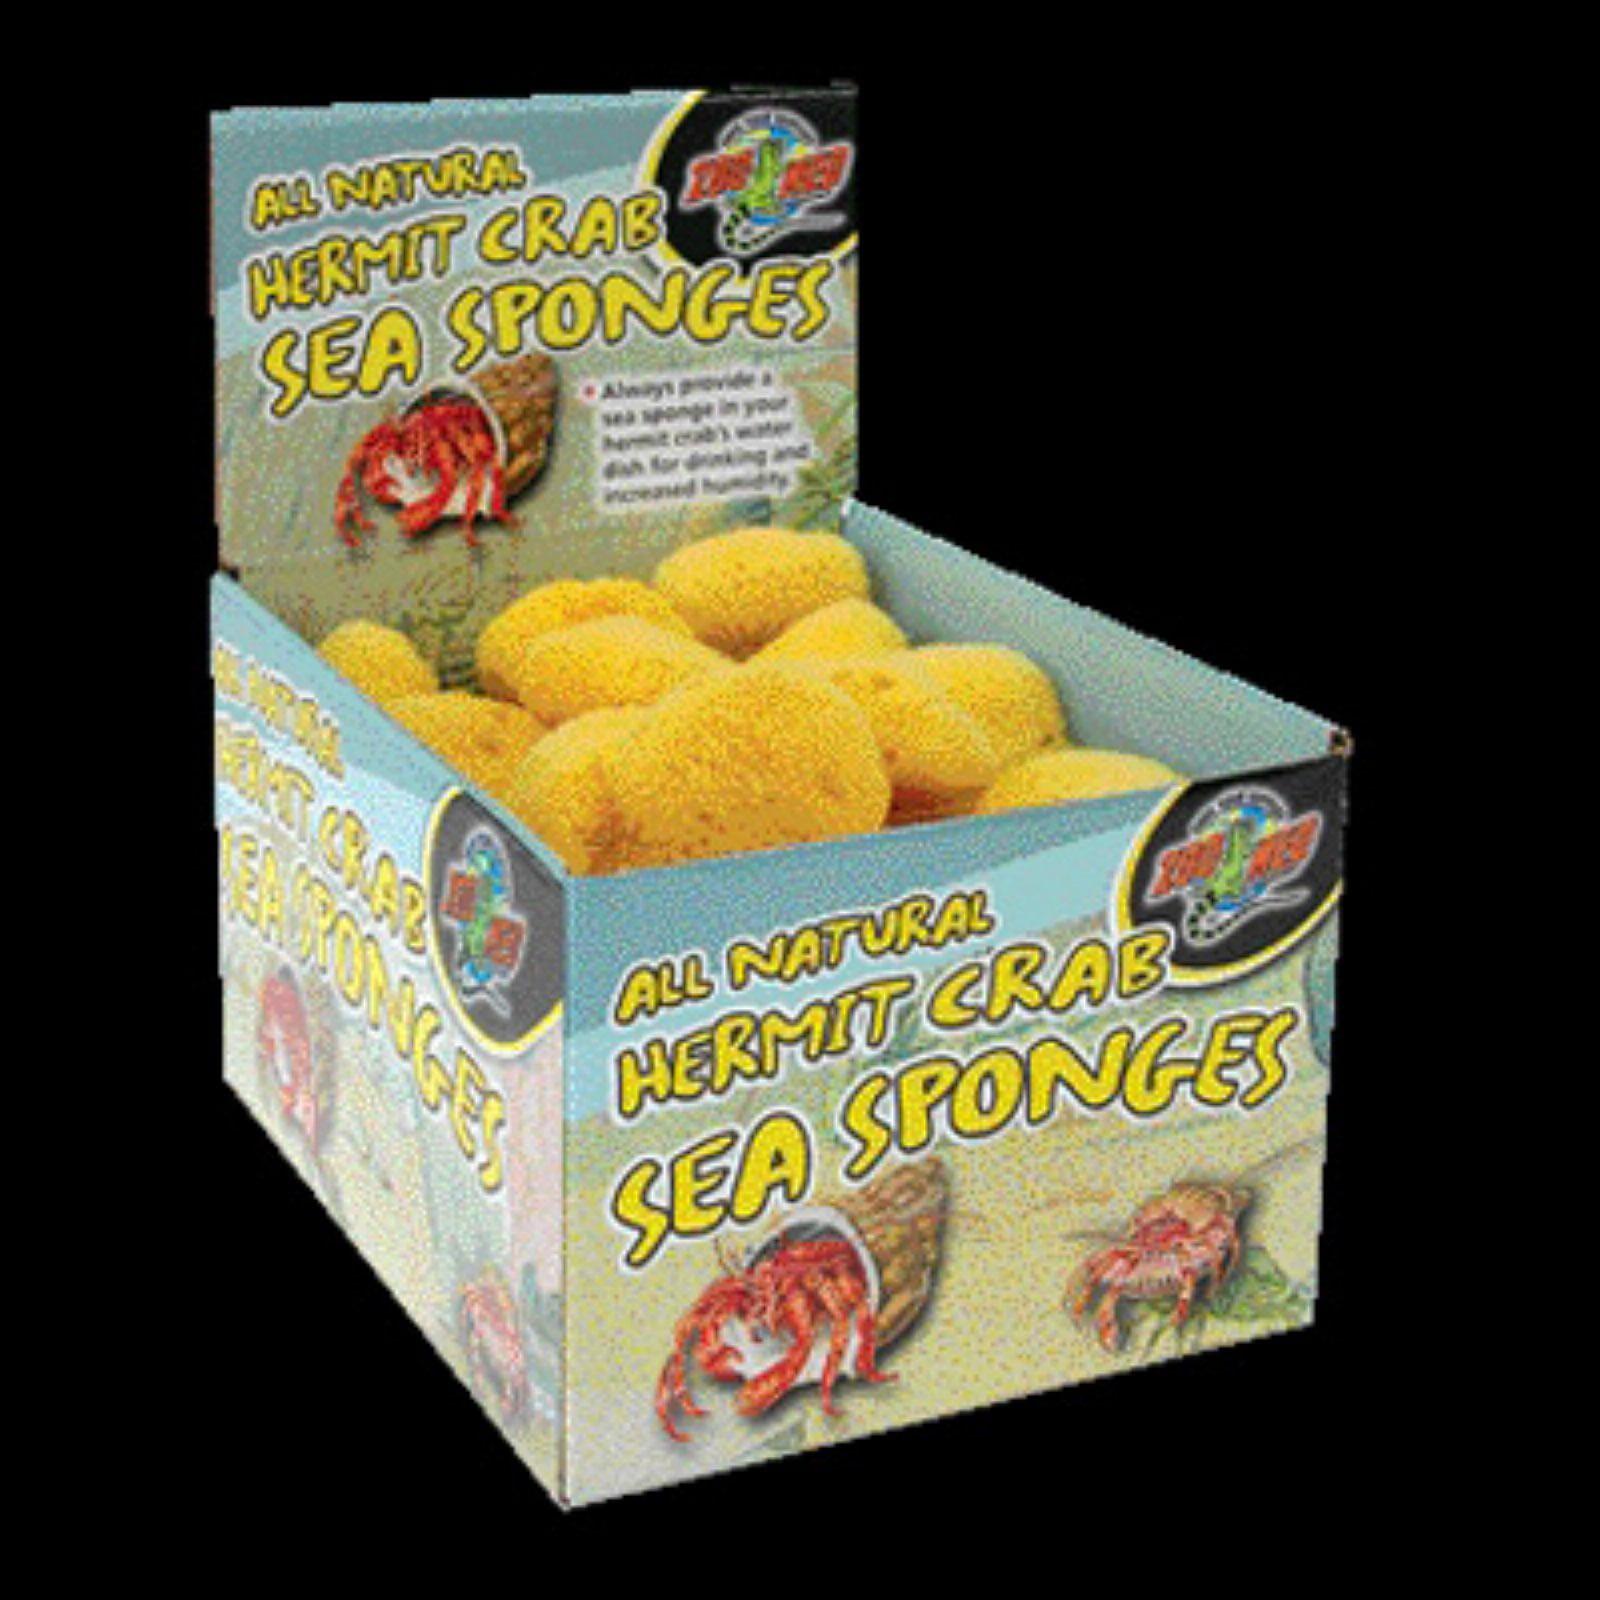 Zoo Med All Natural Hermit Crab Sponge - 36 pc. Display Pack